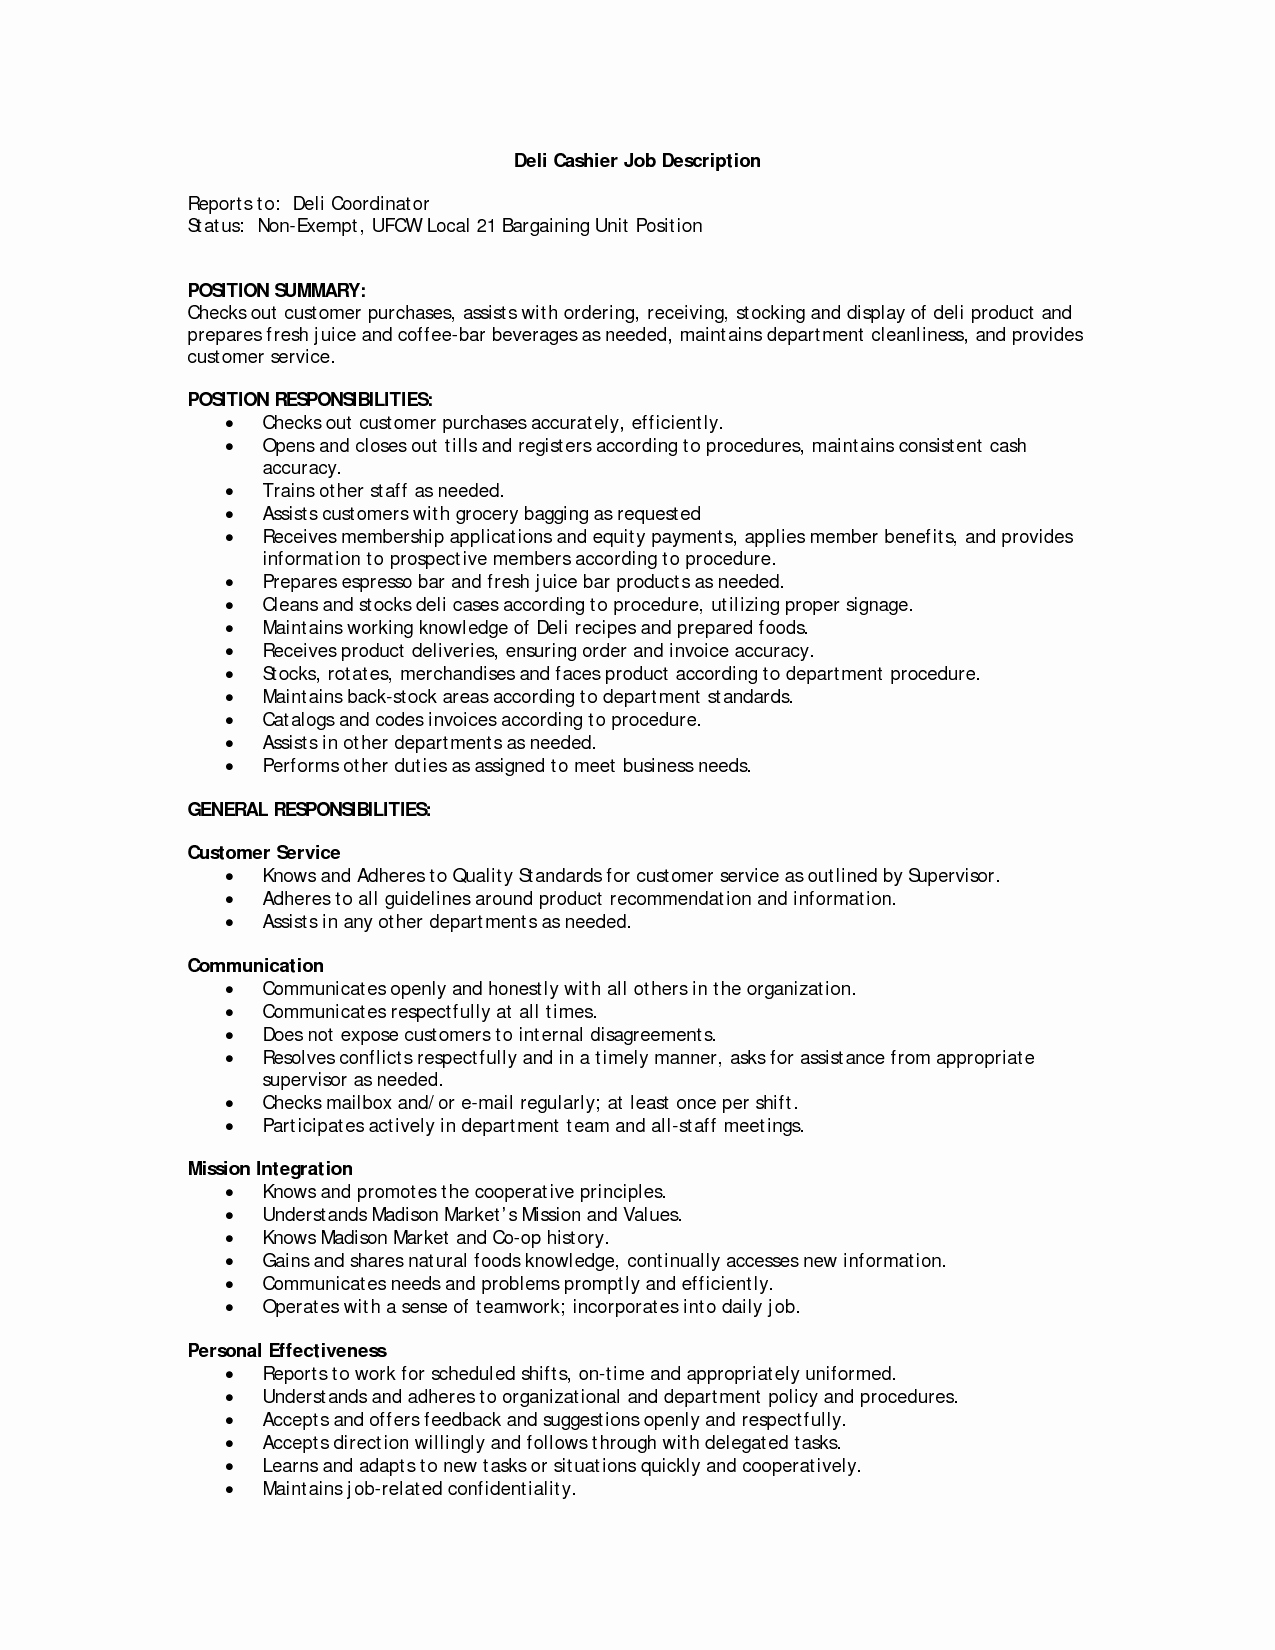 Cashier Responsibilities for Resume Samplebusinessresume